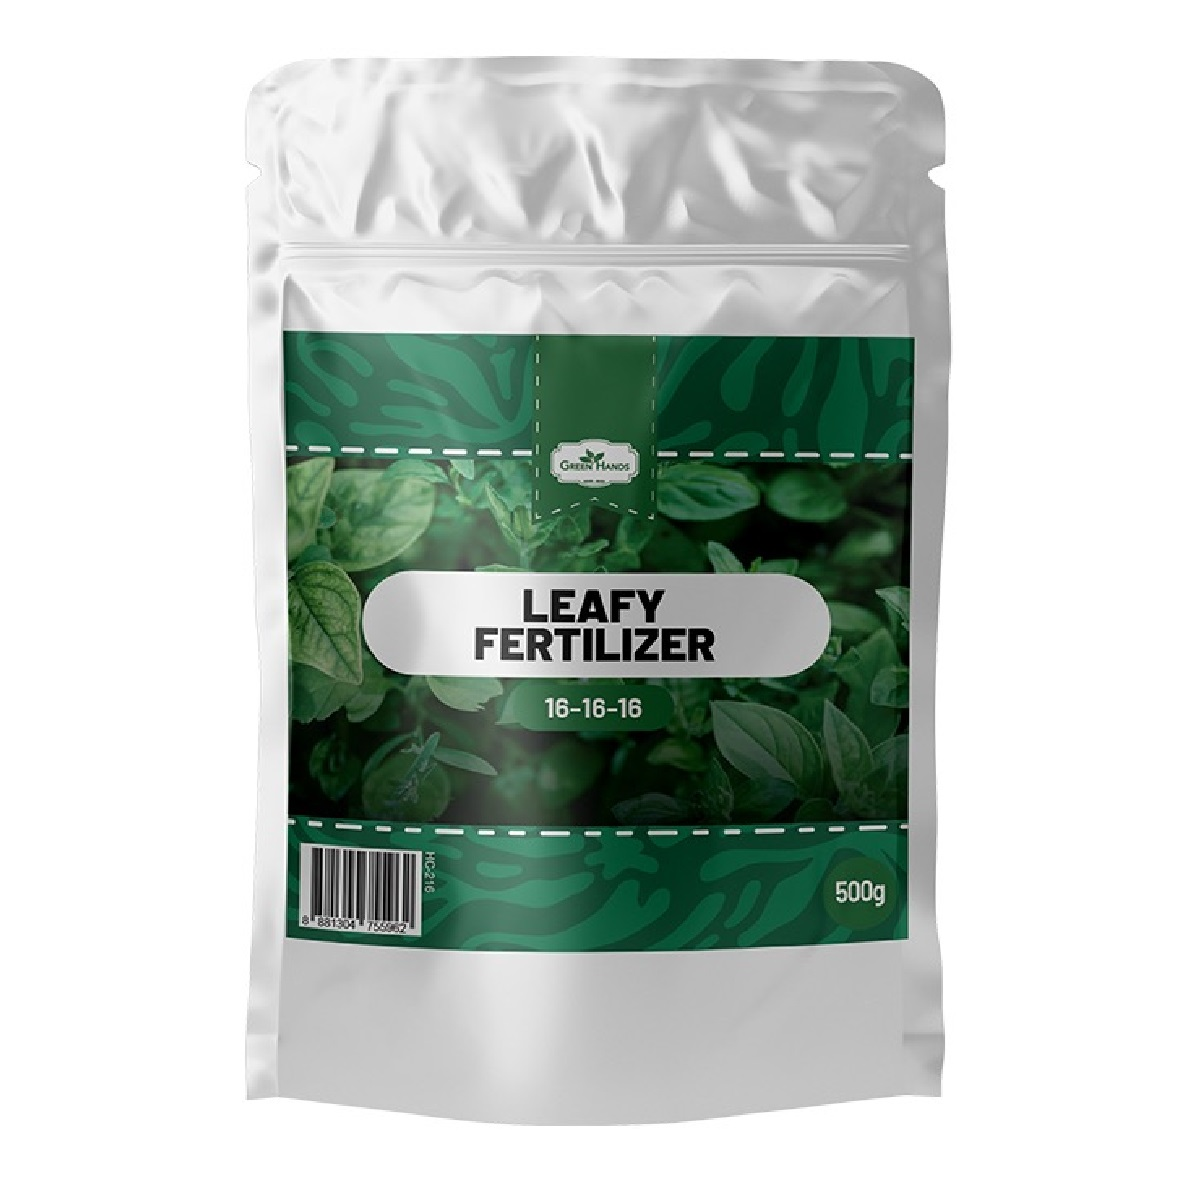 Green Hands 16-16-16 Leafy Fertilizer 500g